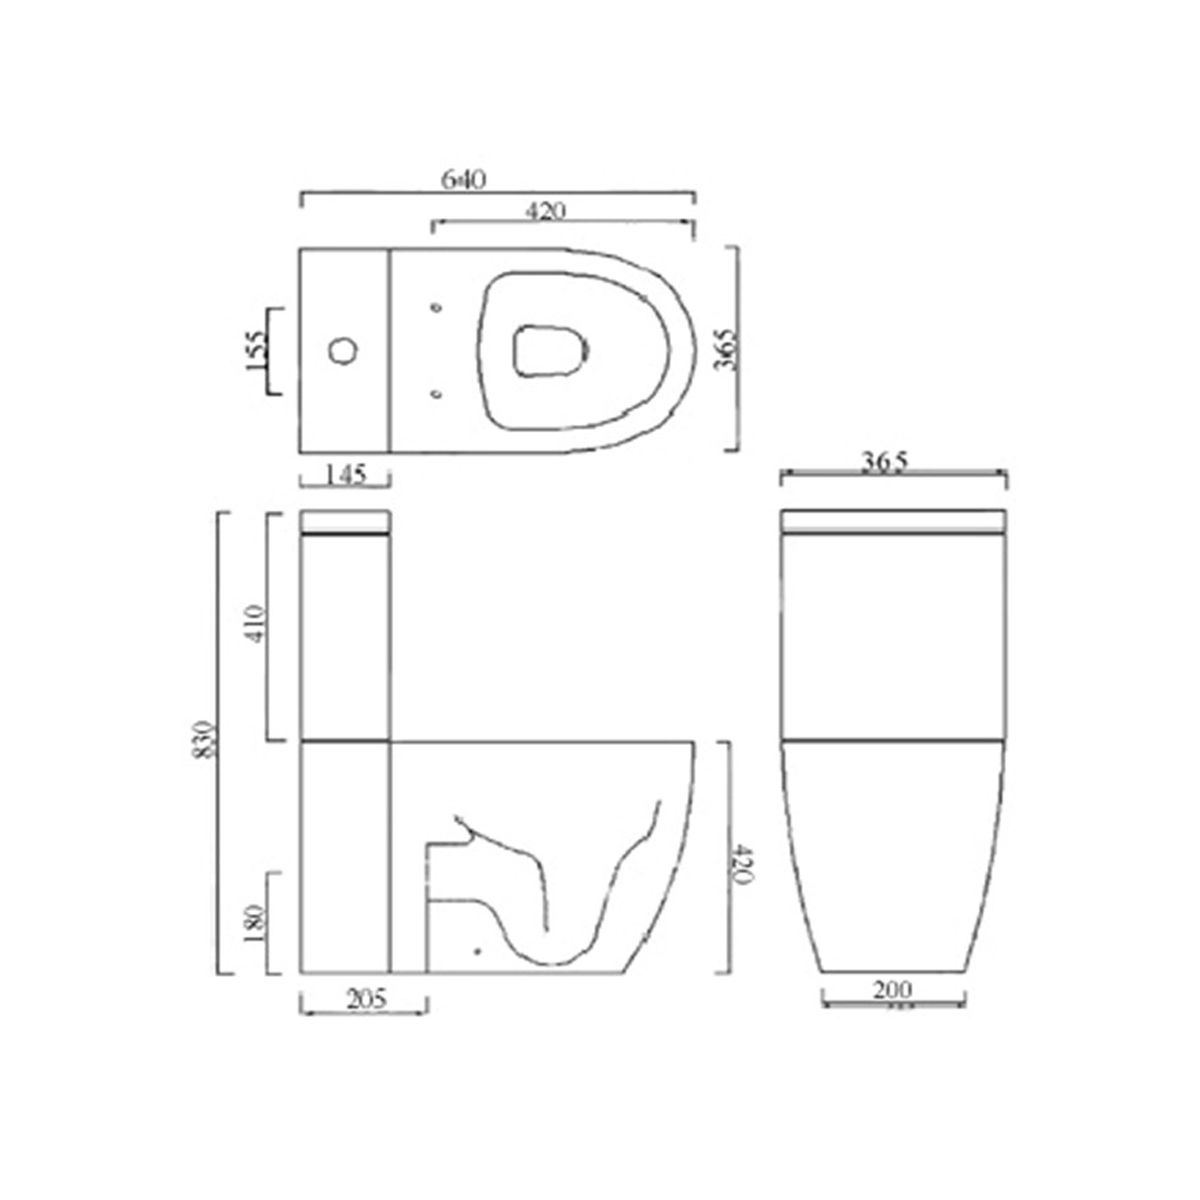 Frontline Emme Close Coupled WC Pan Measurements